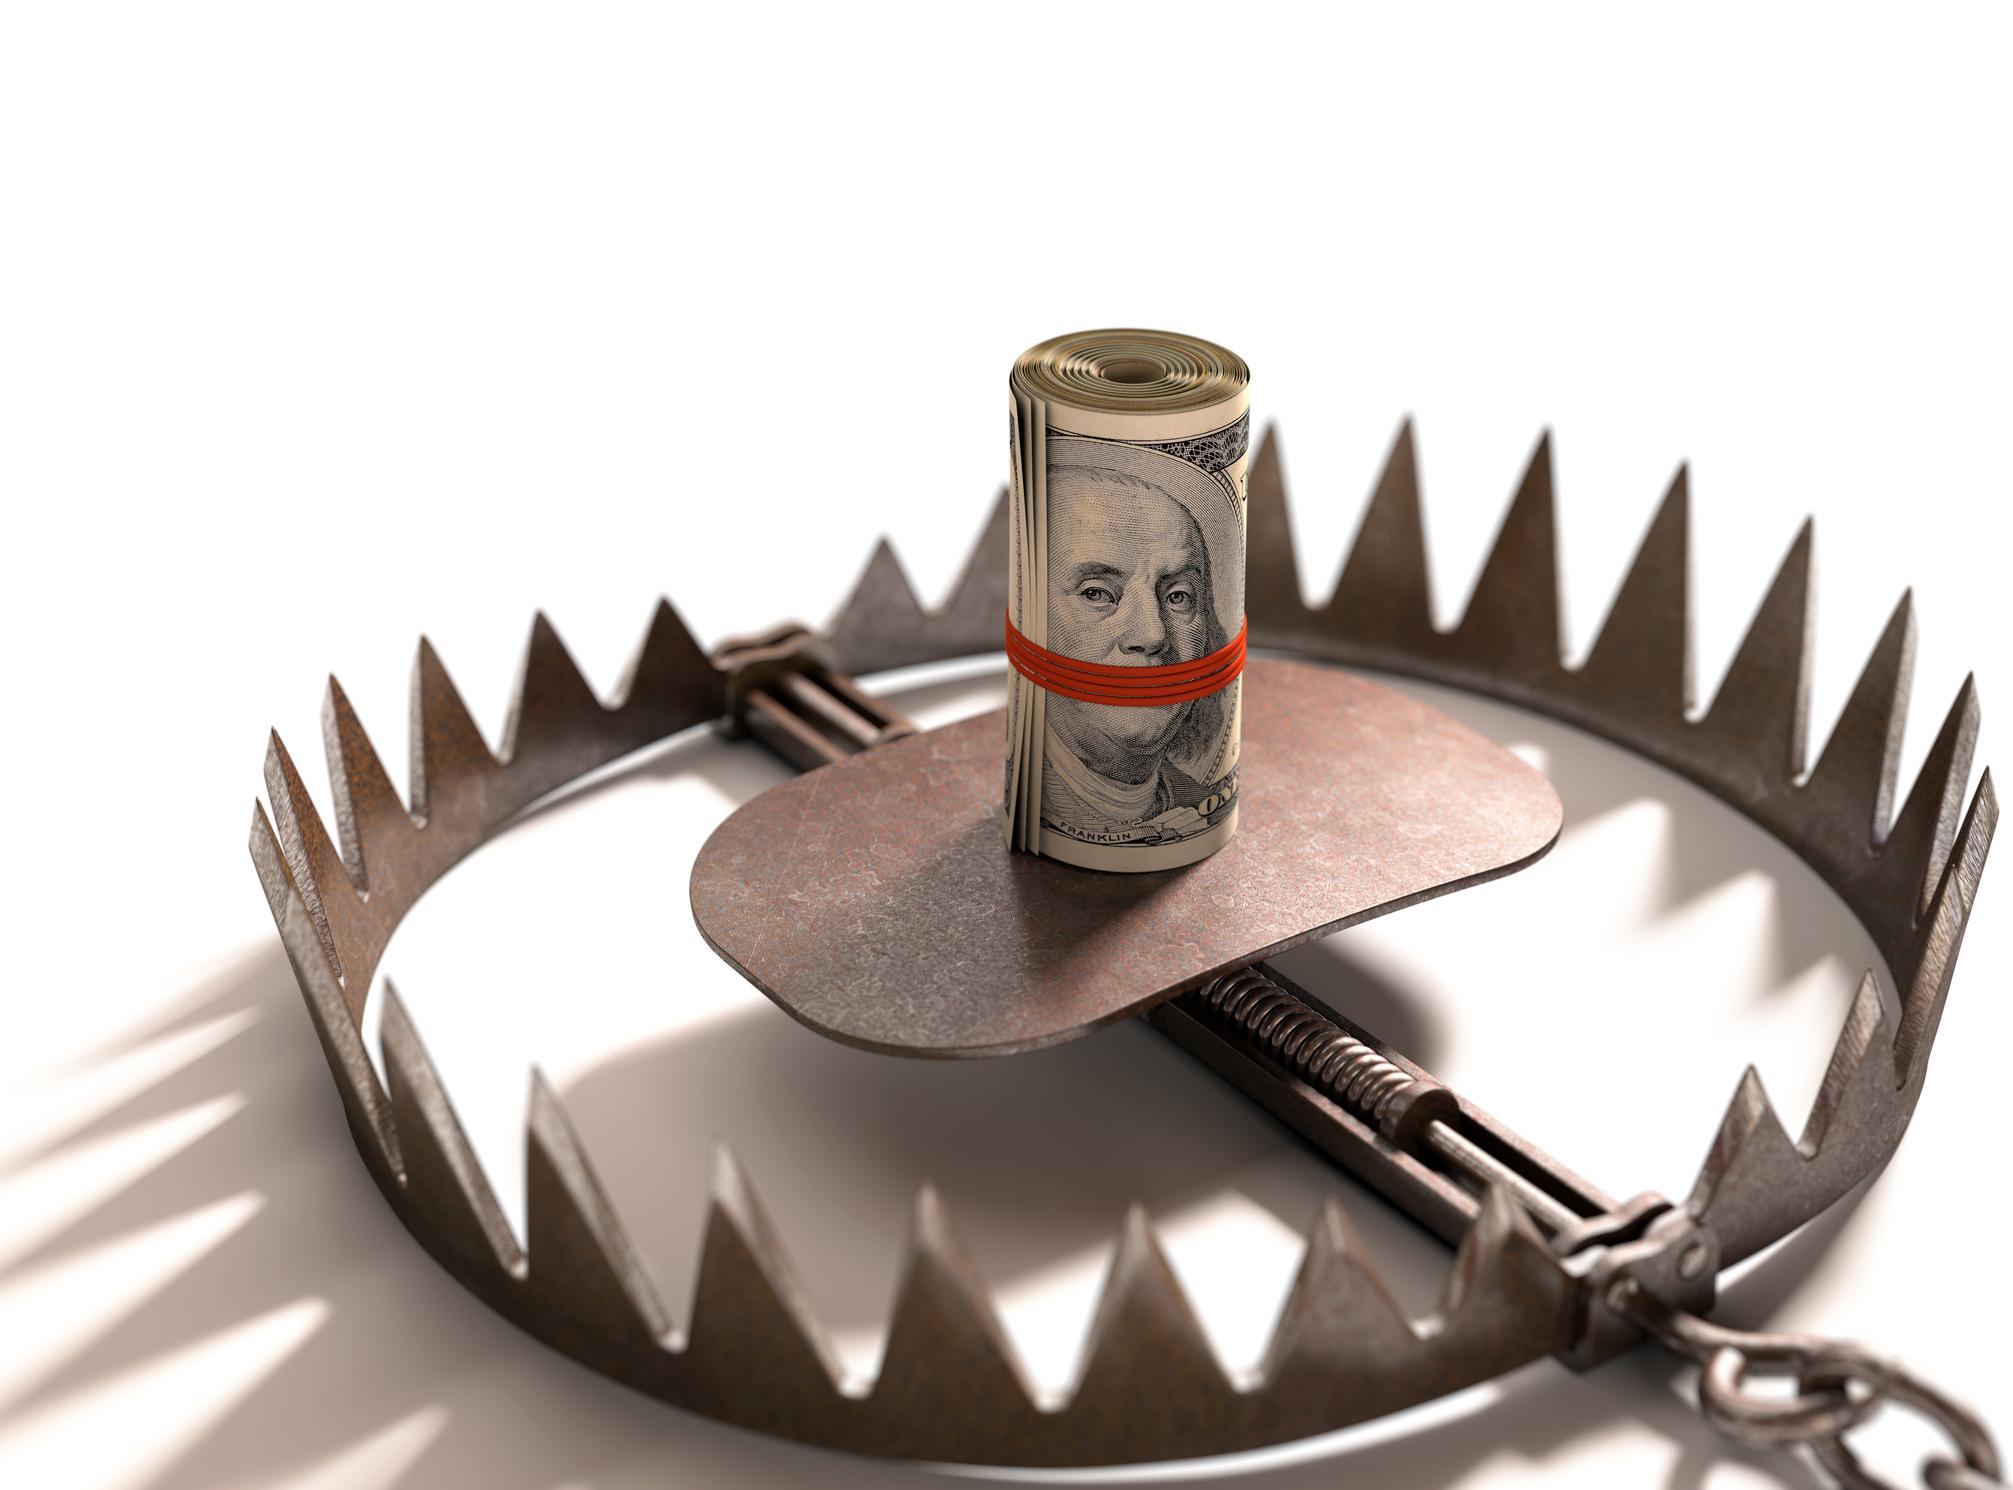 Bear trap using money as bait.